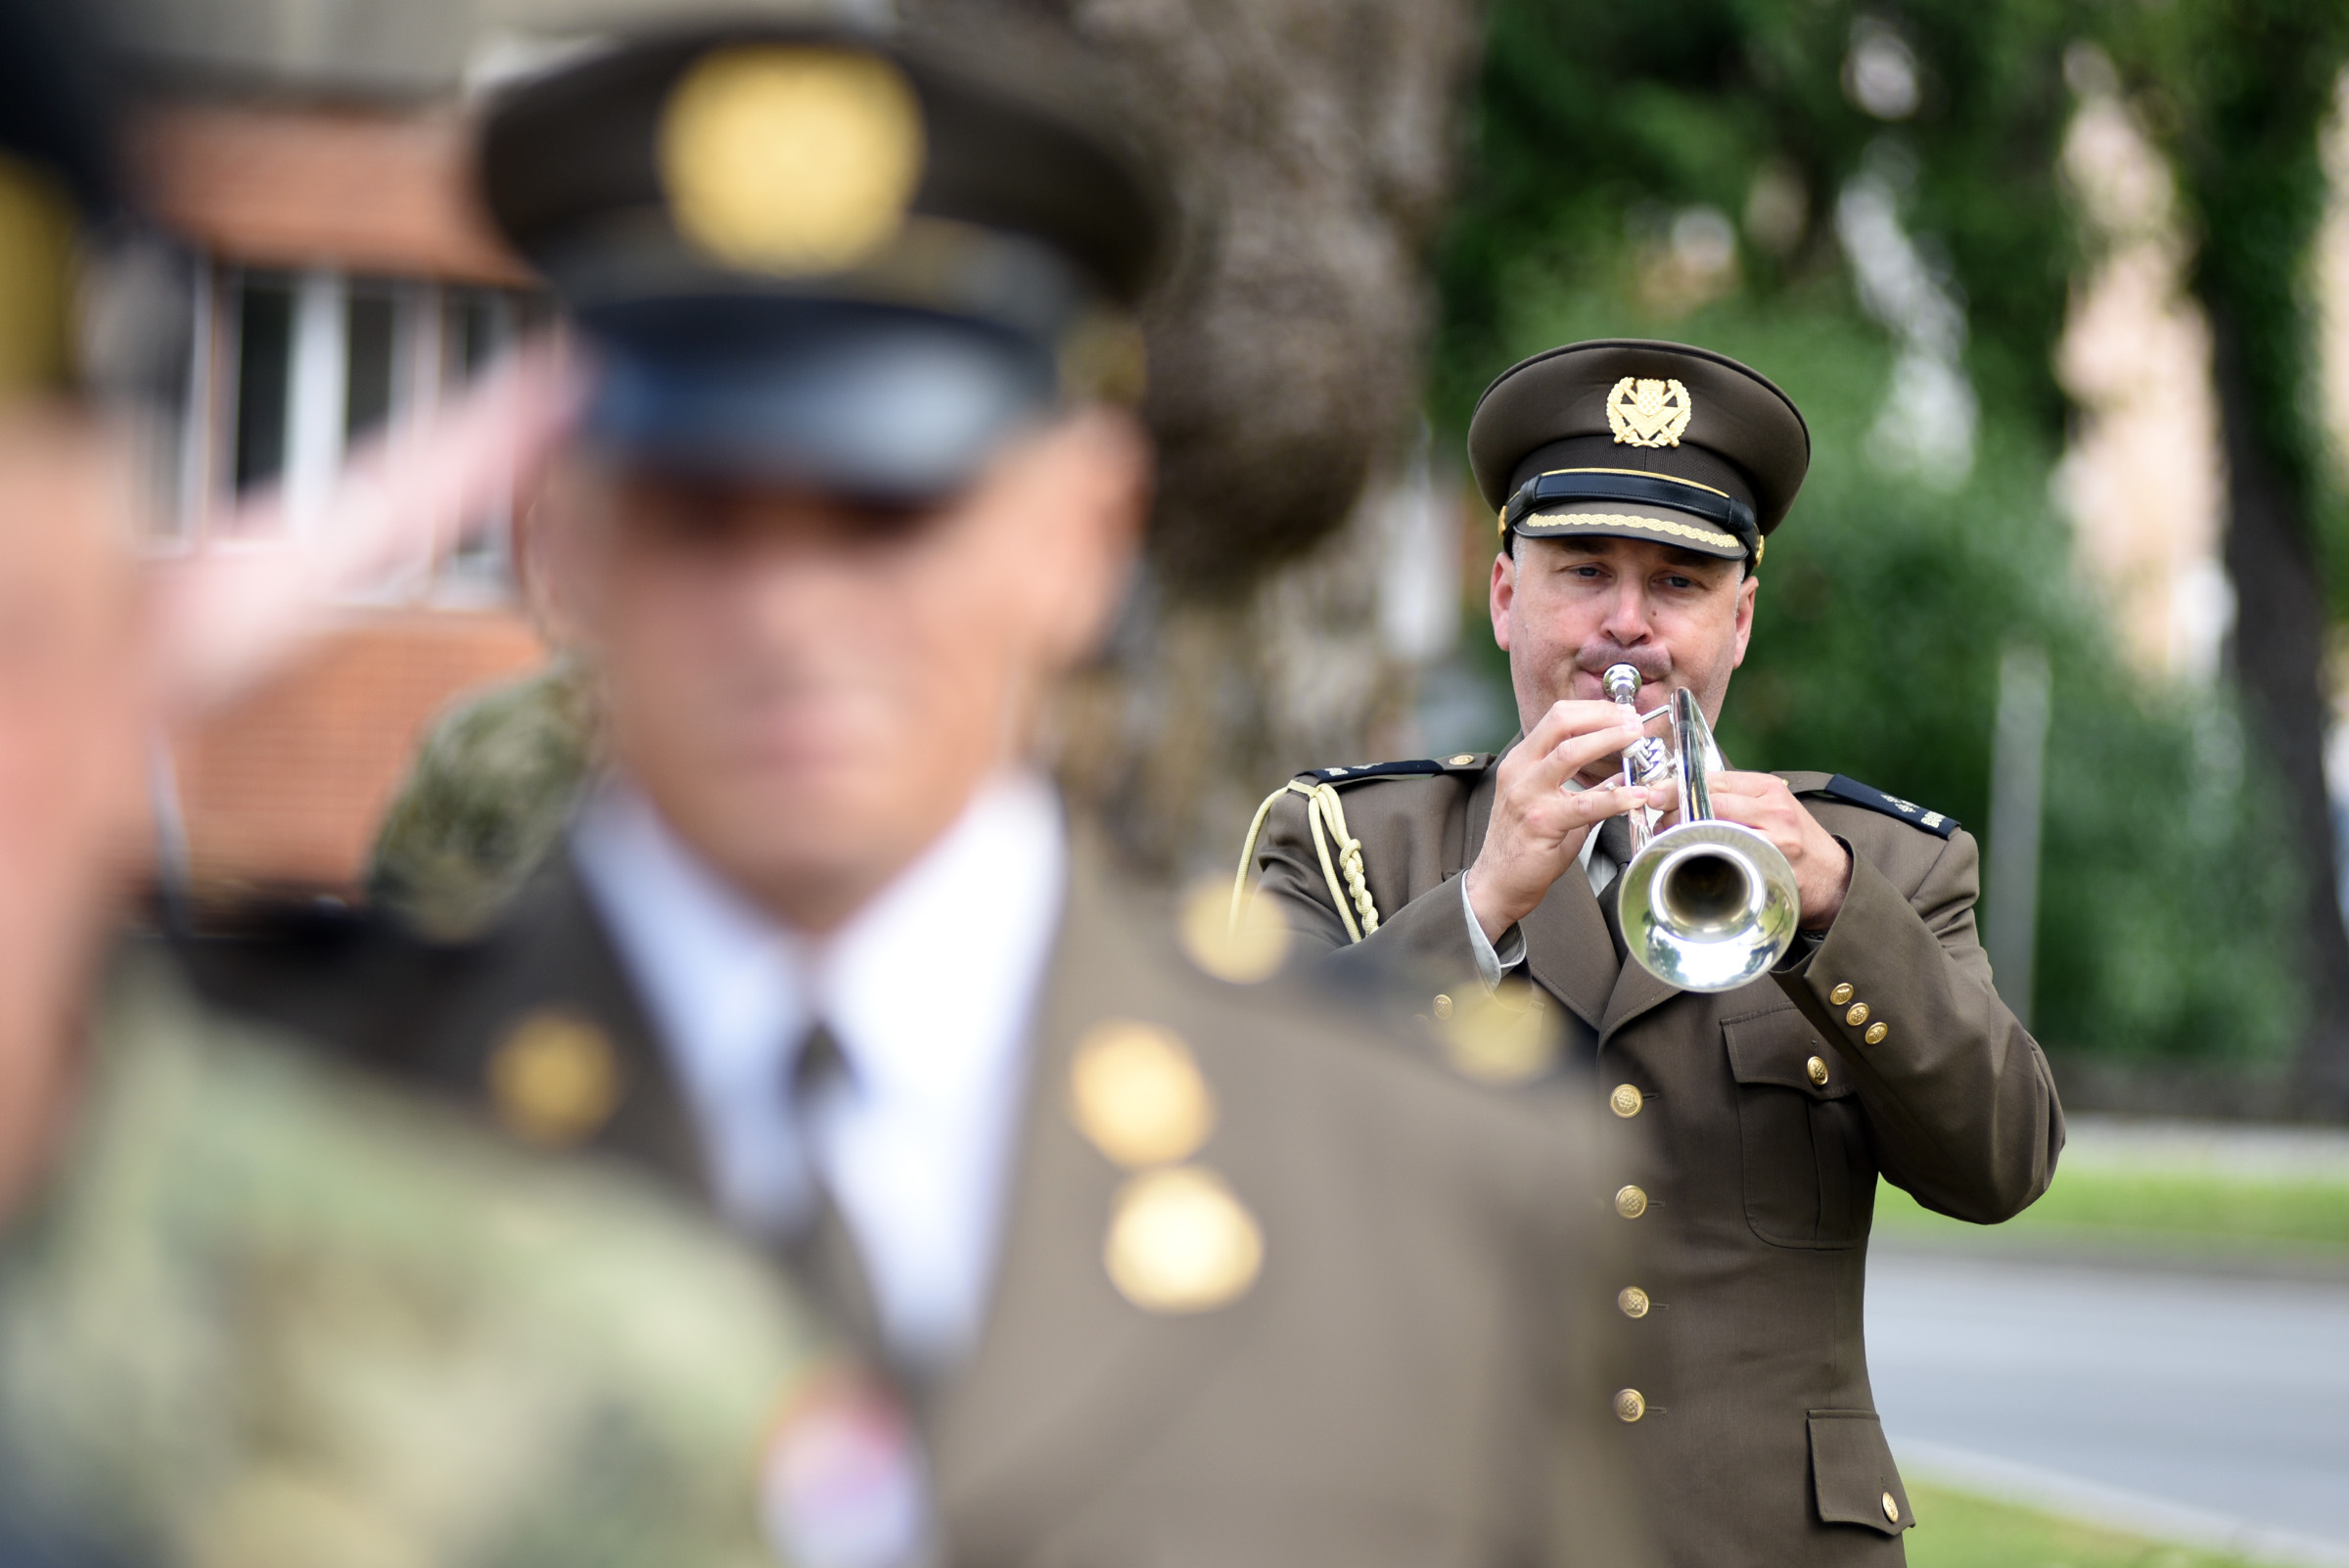 U Karlovcu obilježen Dan Hrvatske kopnene vojske